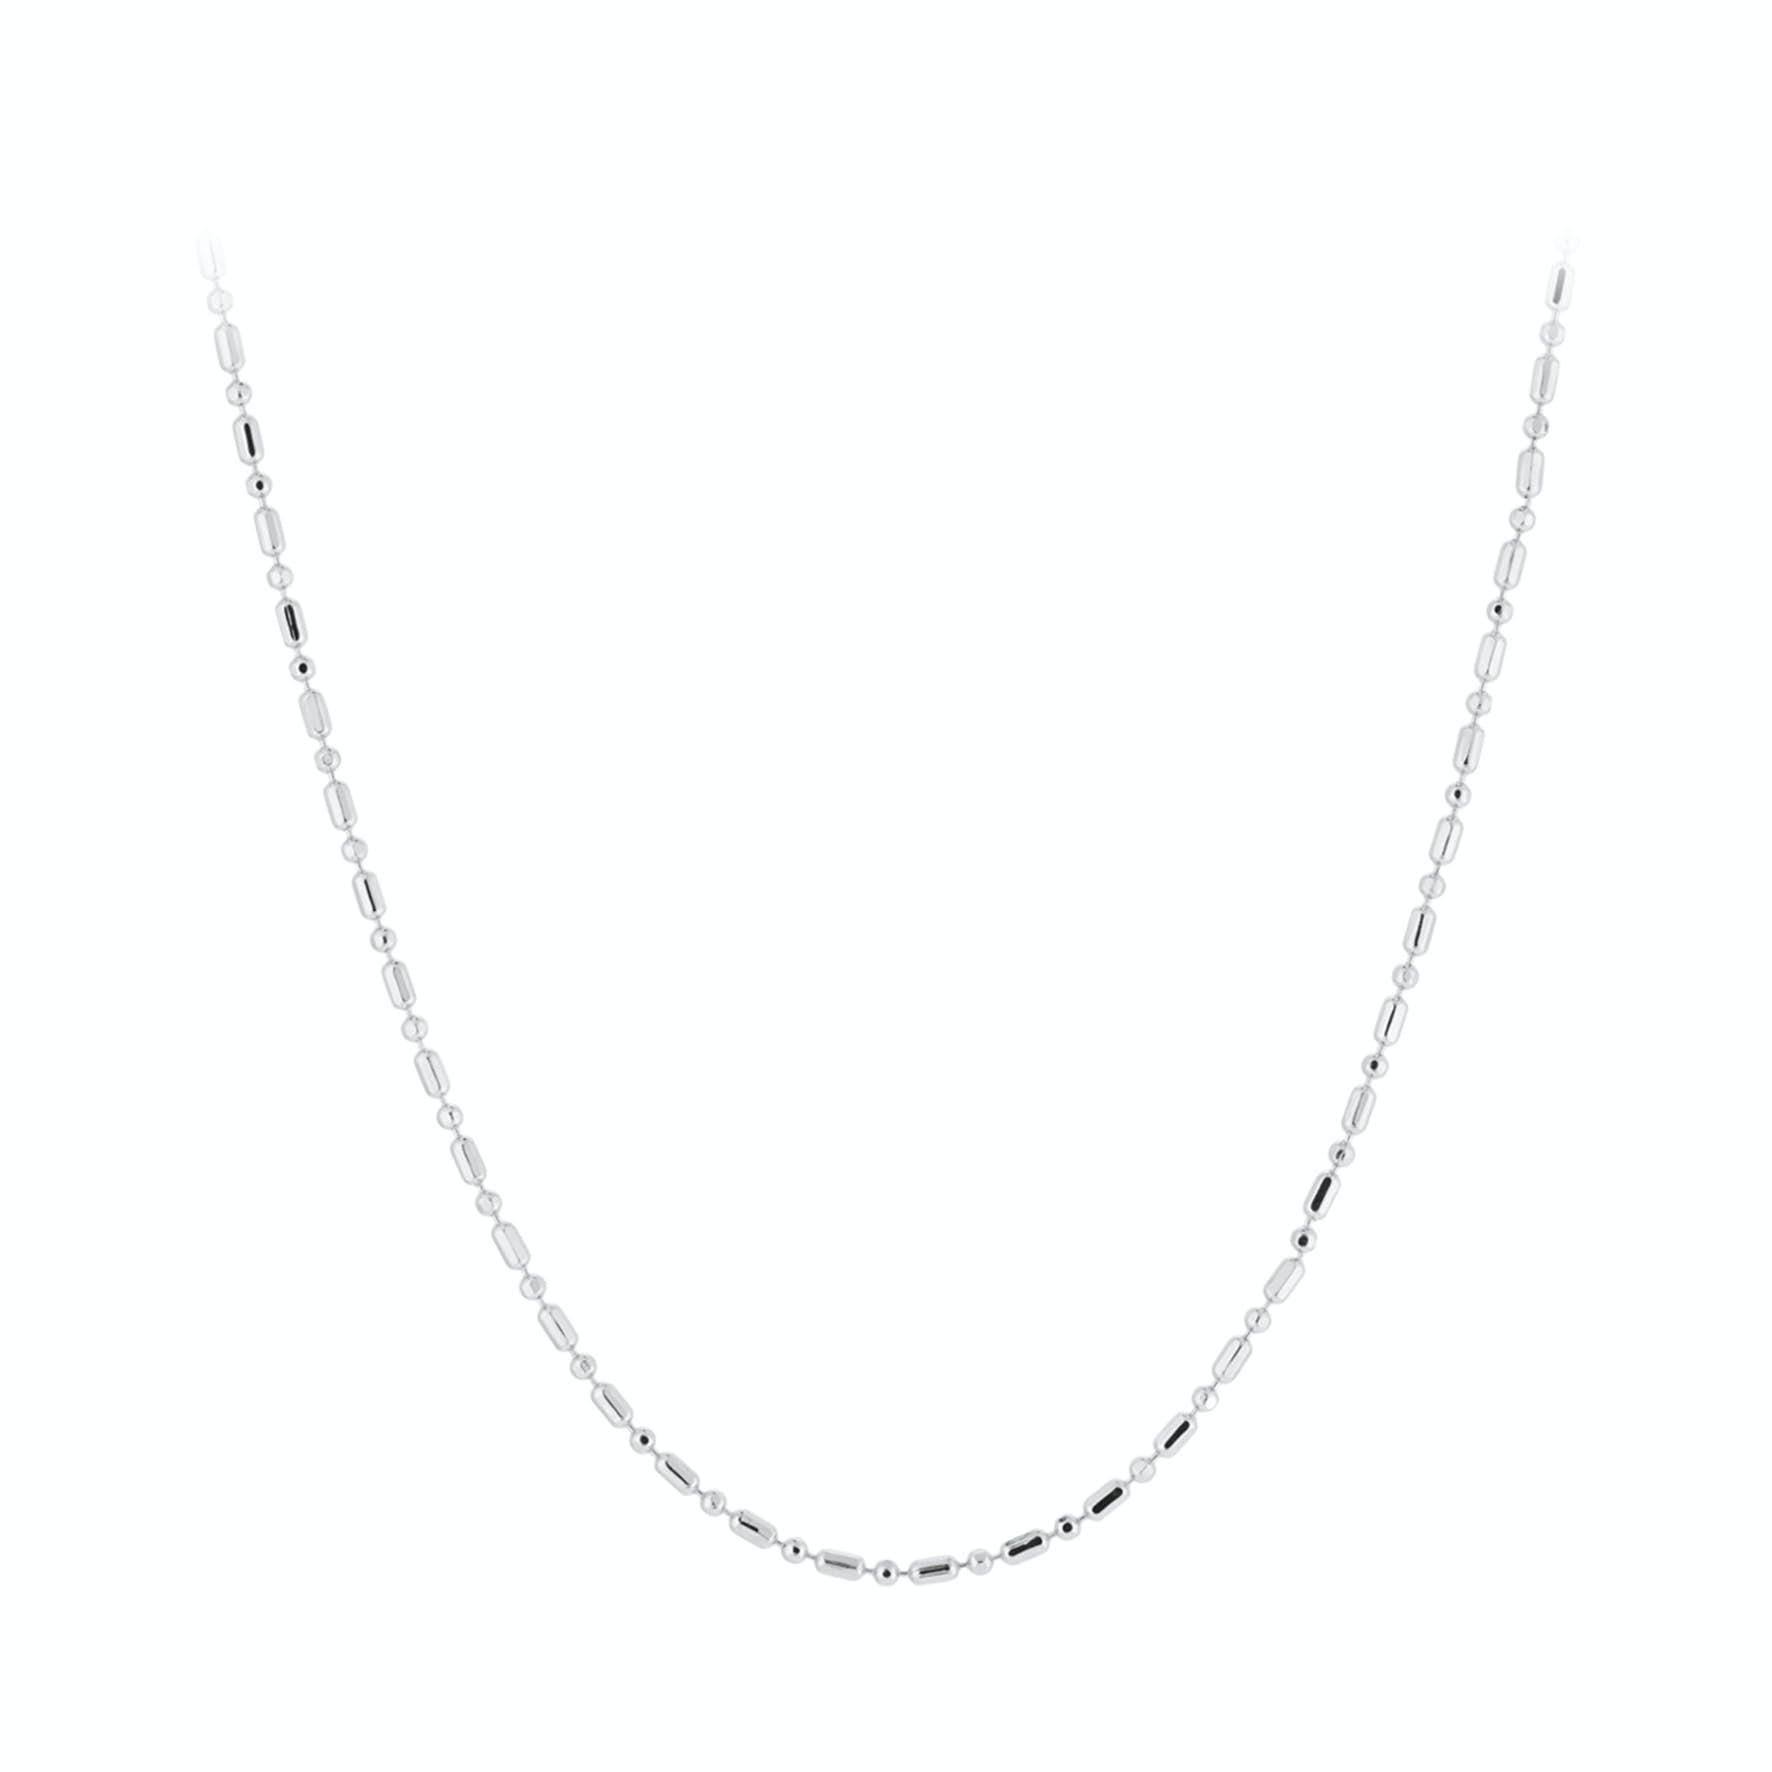 Evelyn Necklace fra Pernille Corydon i Sølv Sterling 925